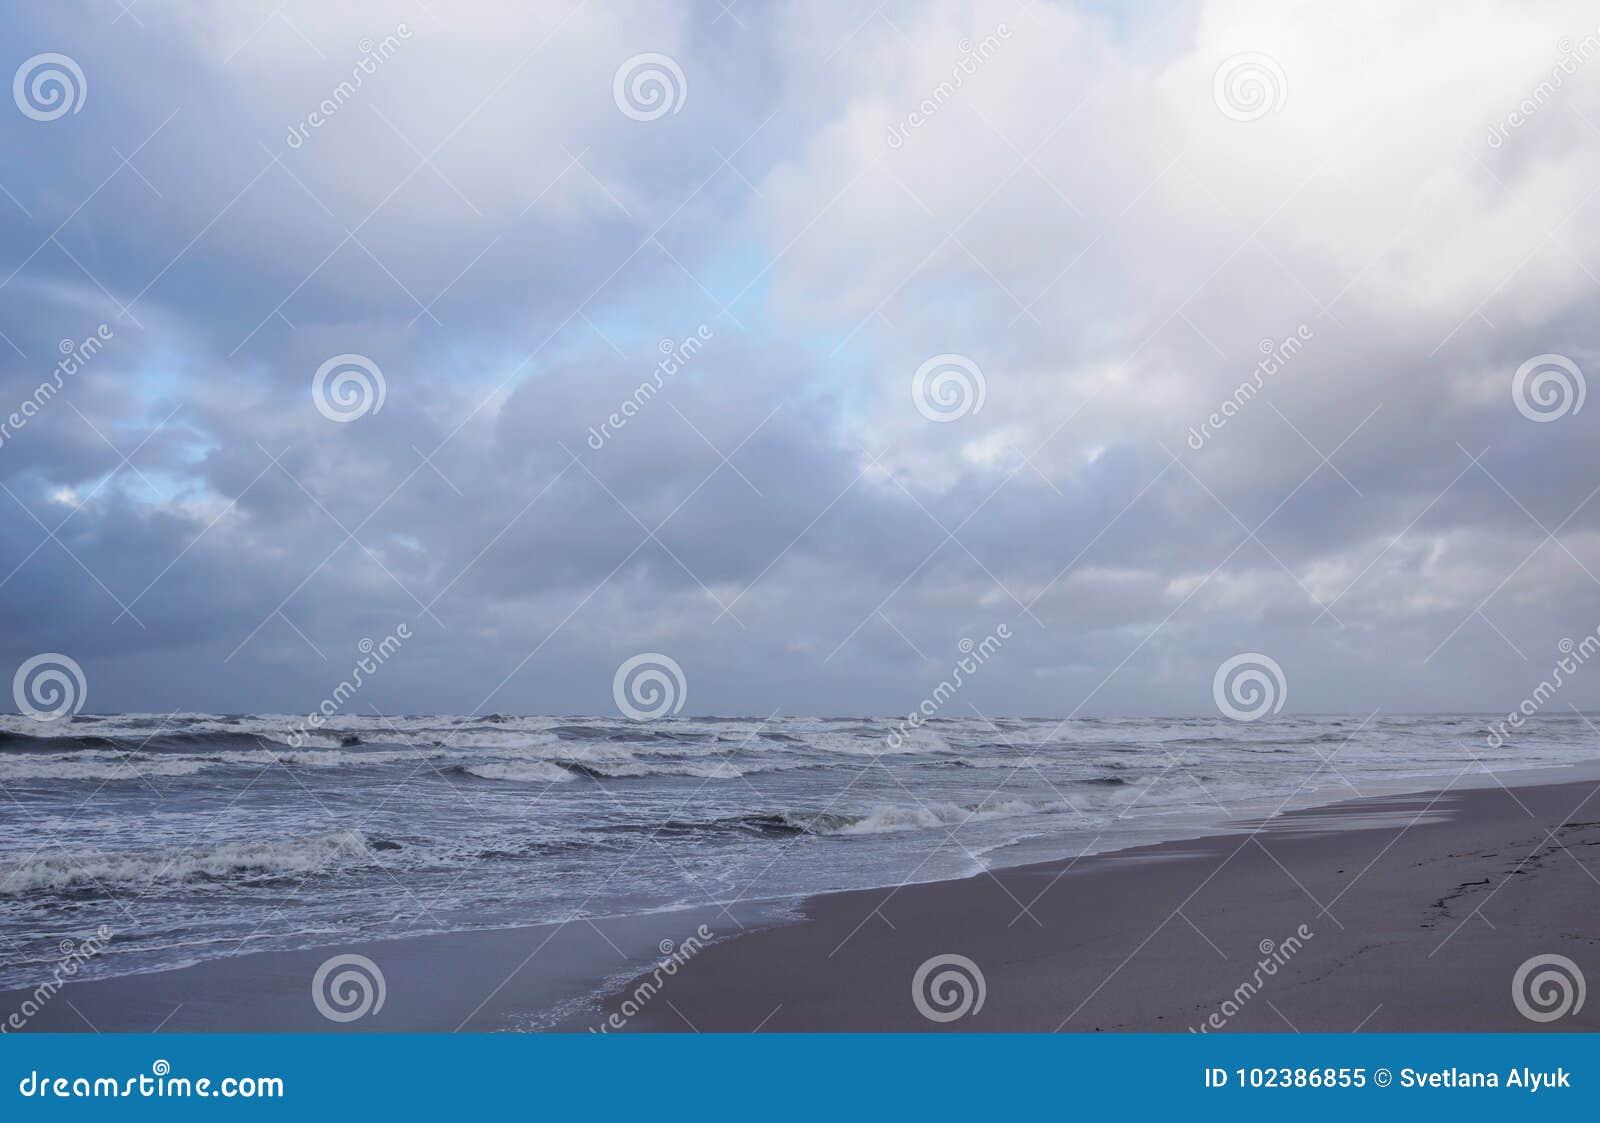 Paisaje de la costa de mar Báltico